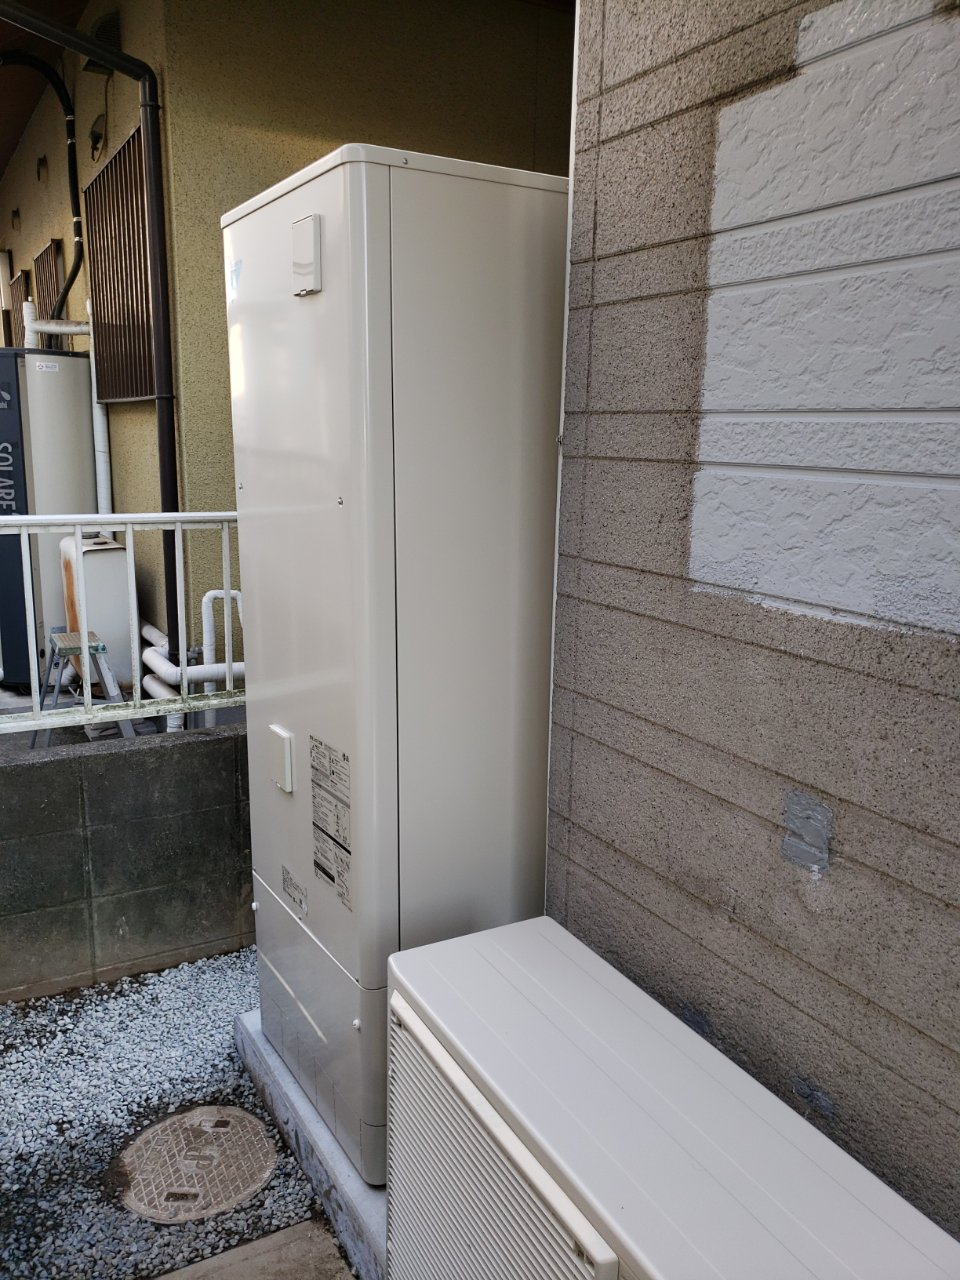 姫路市 給湯器入替え工事